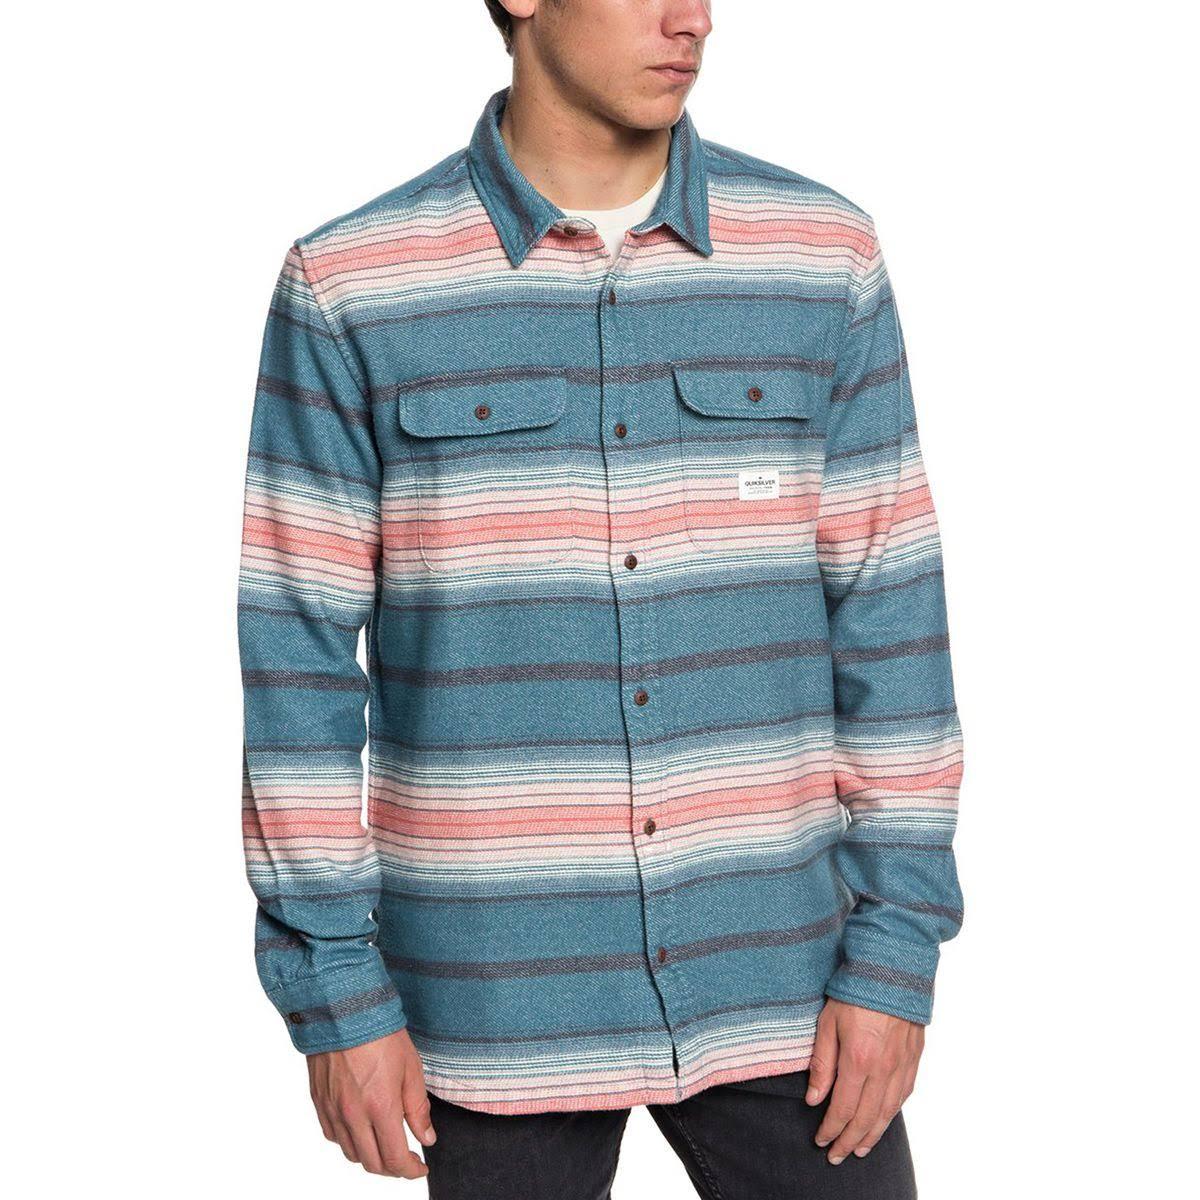 Azul Quiksilver Para De Franela Hombre Kanagawa Franja Camisa xSxqv0O